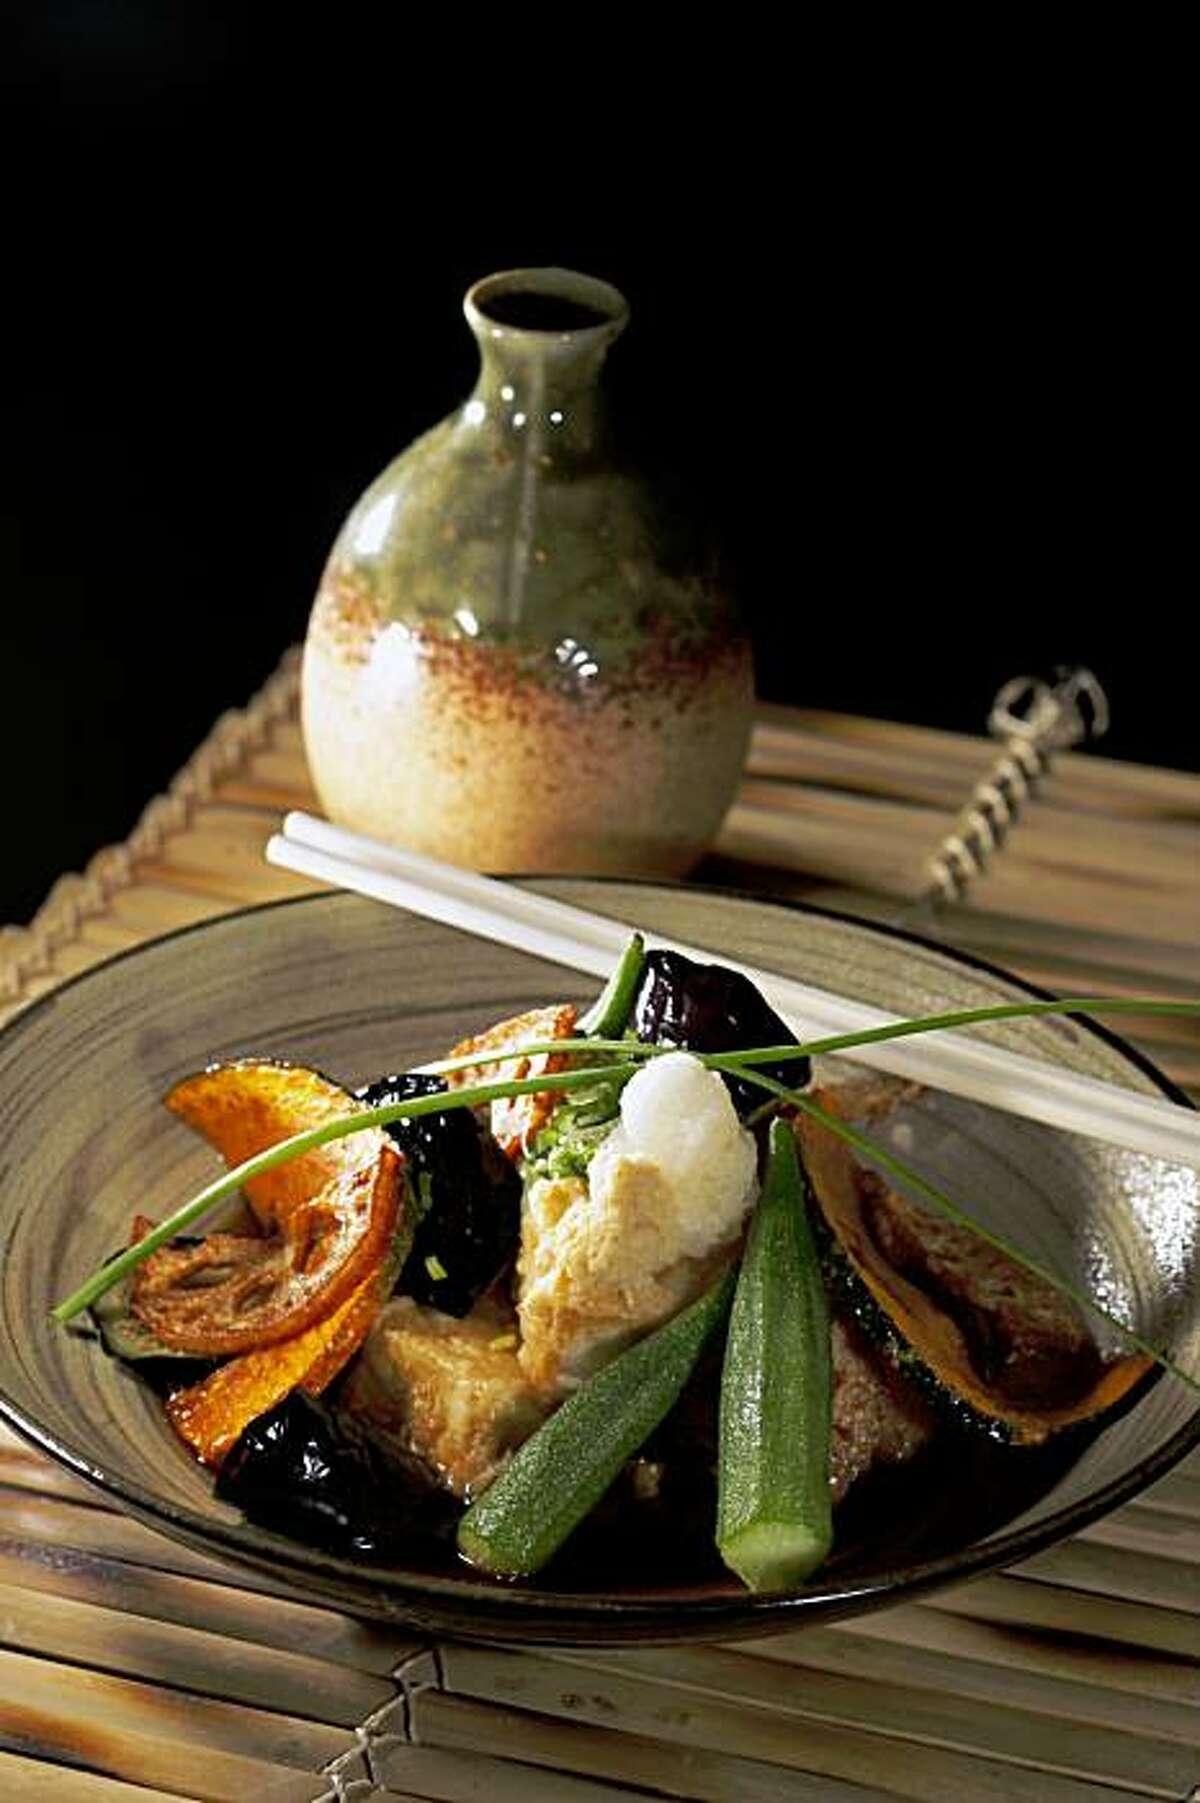 Agedashi- tofu is seen at Sakae Sushi and Grill in Brisbane, Calif. on Thursday November 12, 2009.